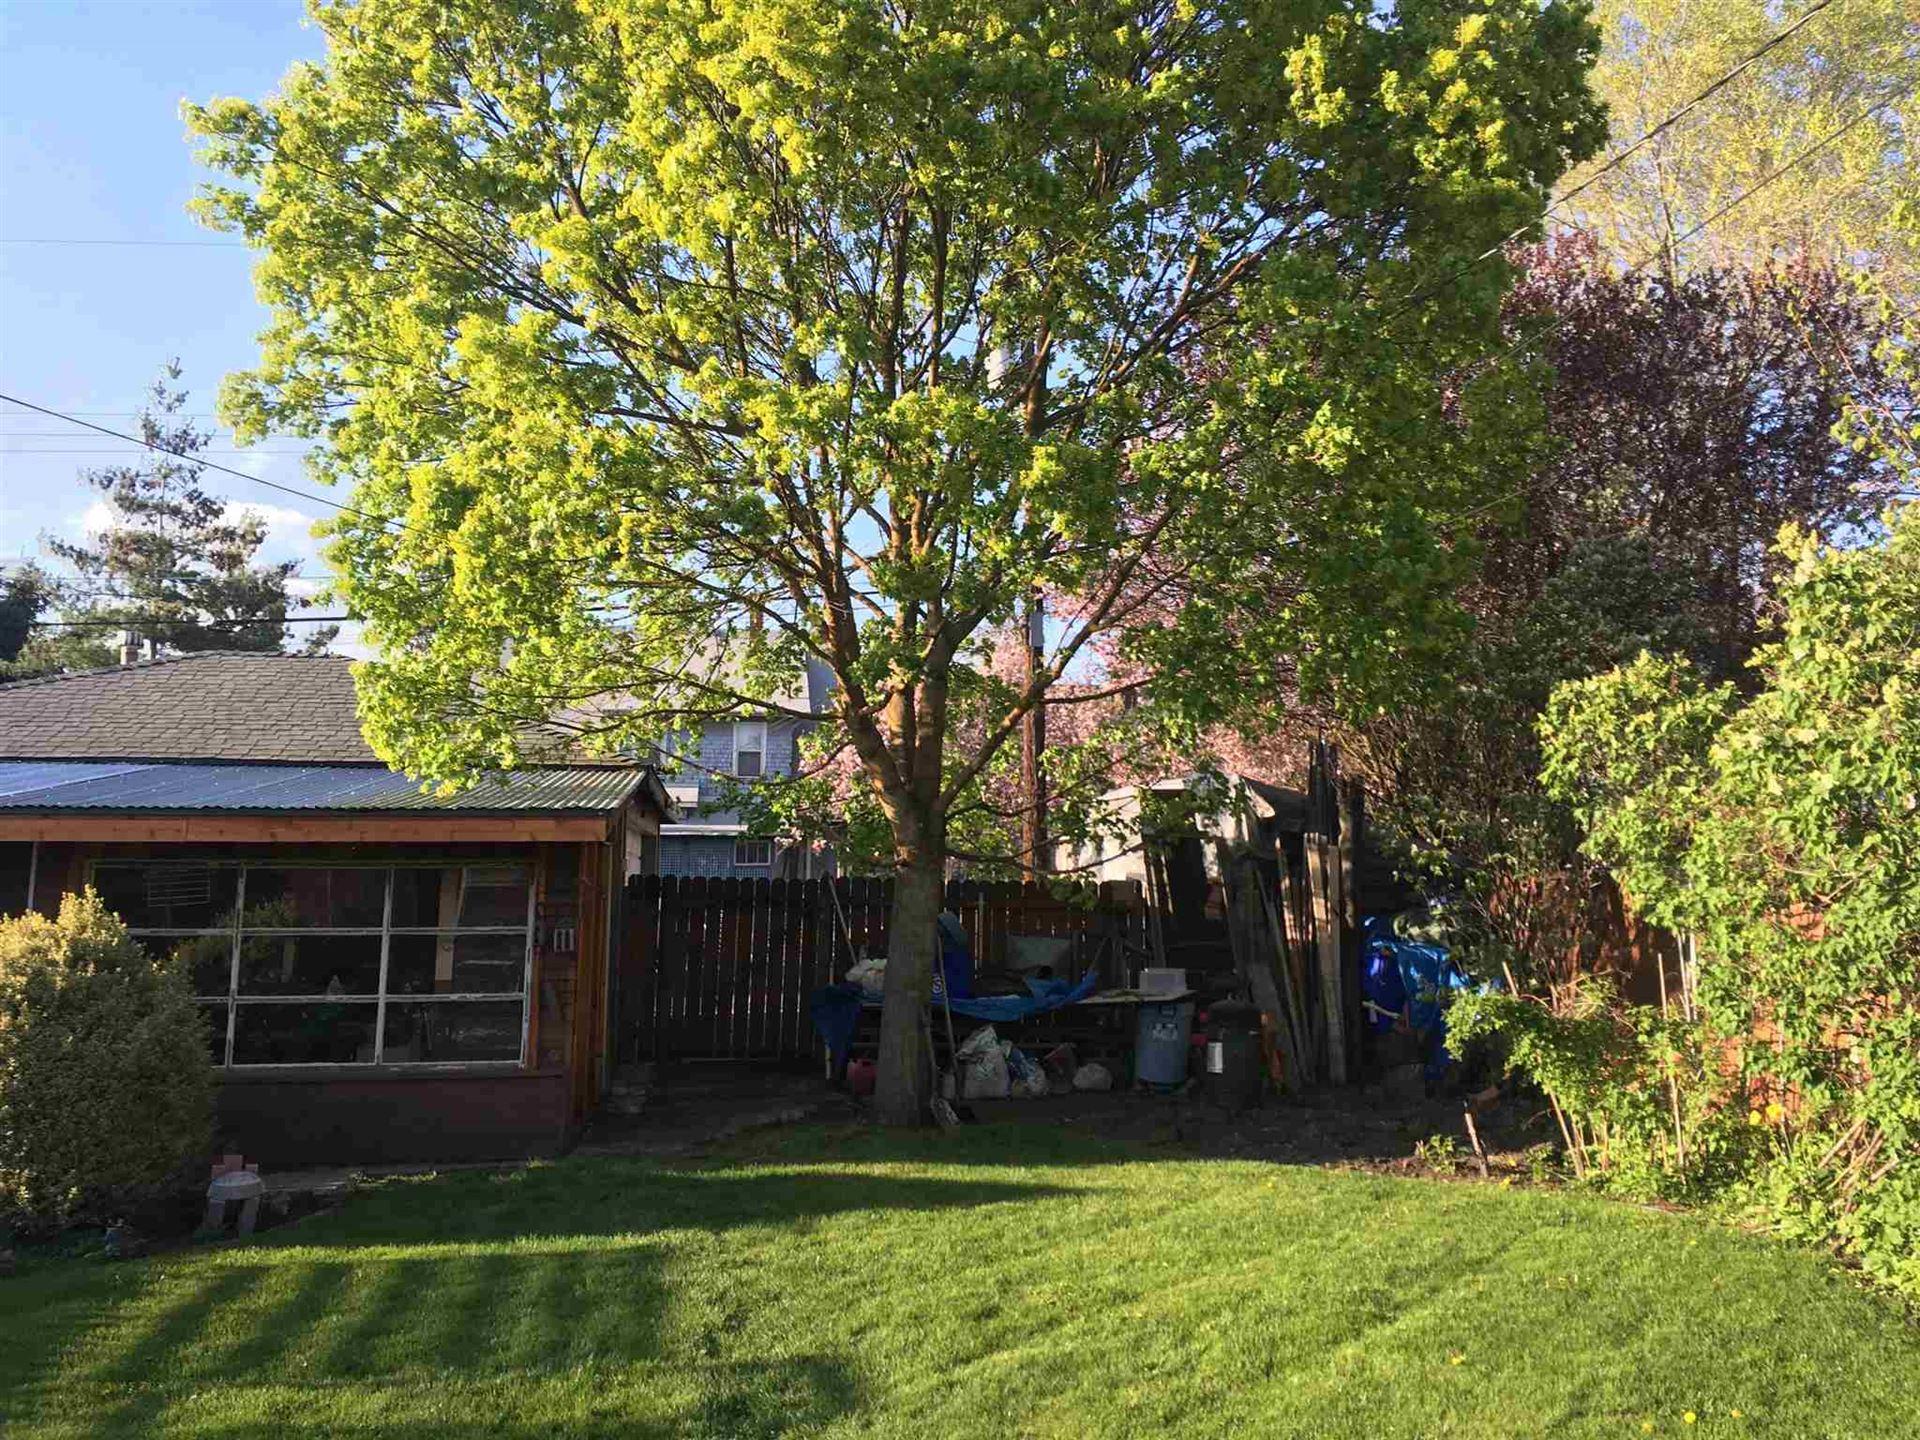 Photo of 411 E Nora Ave, Spokane, WA 99207 (MLS # 202124087)